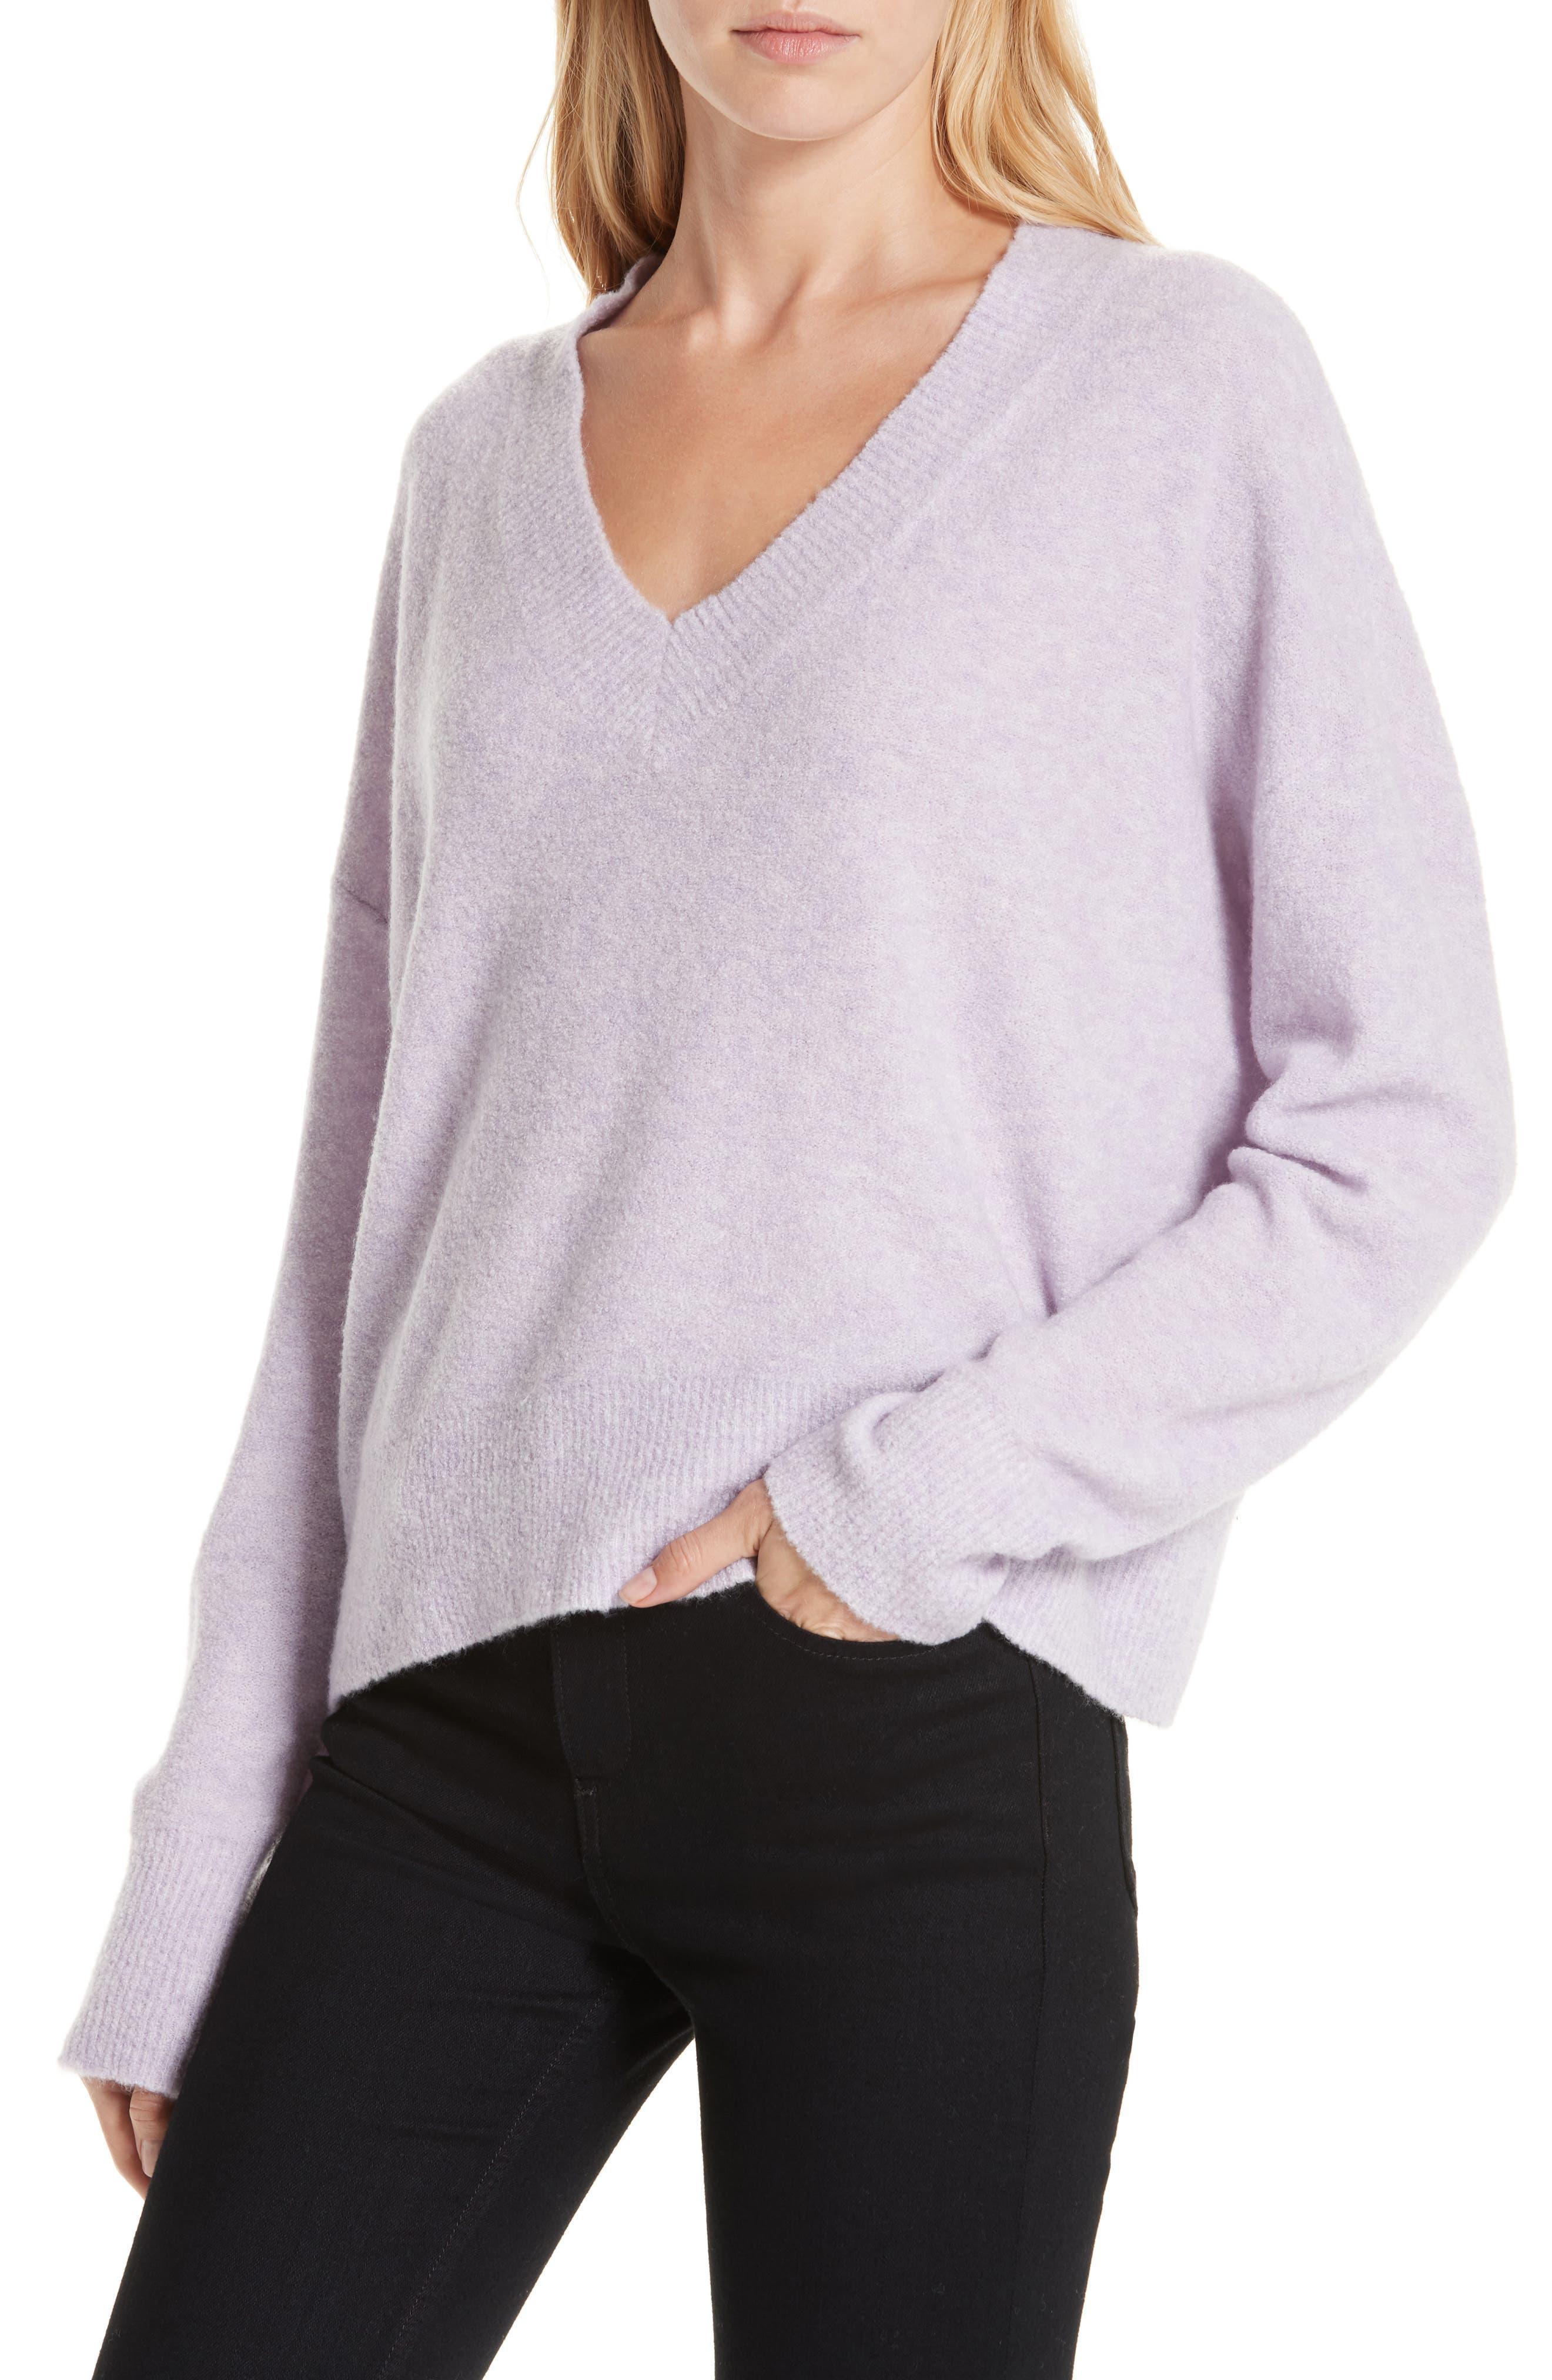 Cashmere Blend Bouclé Sweater,                             Alternate thumbnail 4, color,                             PURPLE HEIRLOOM HEATHER